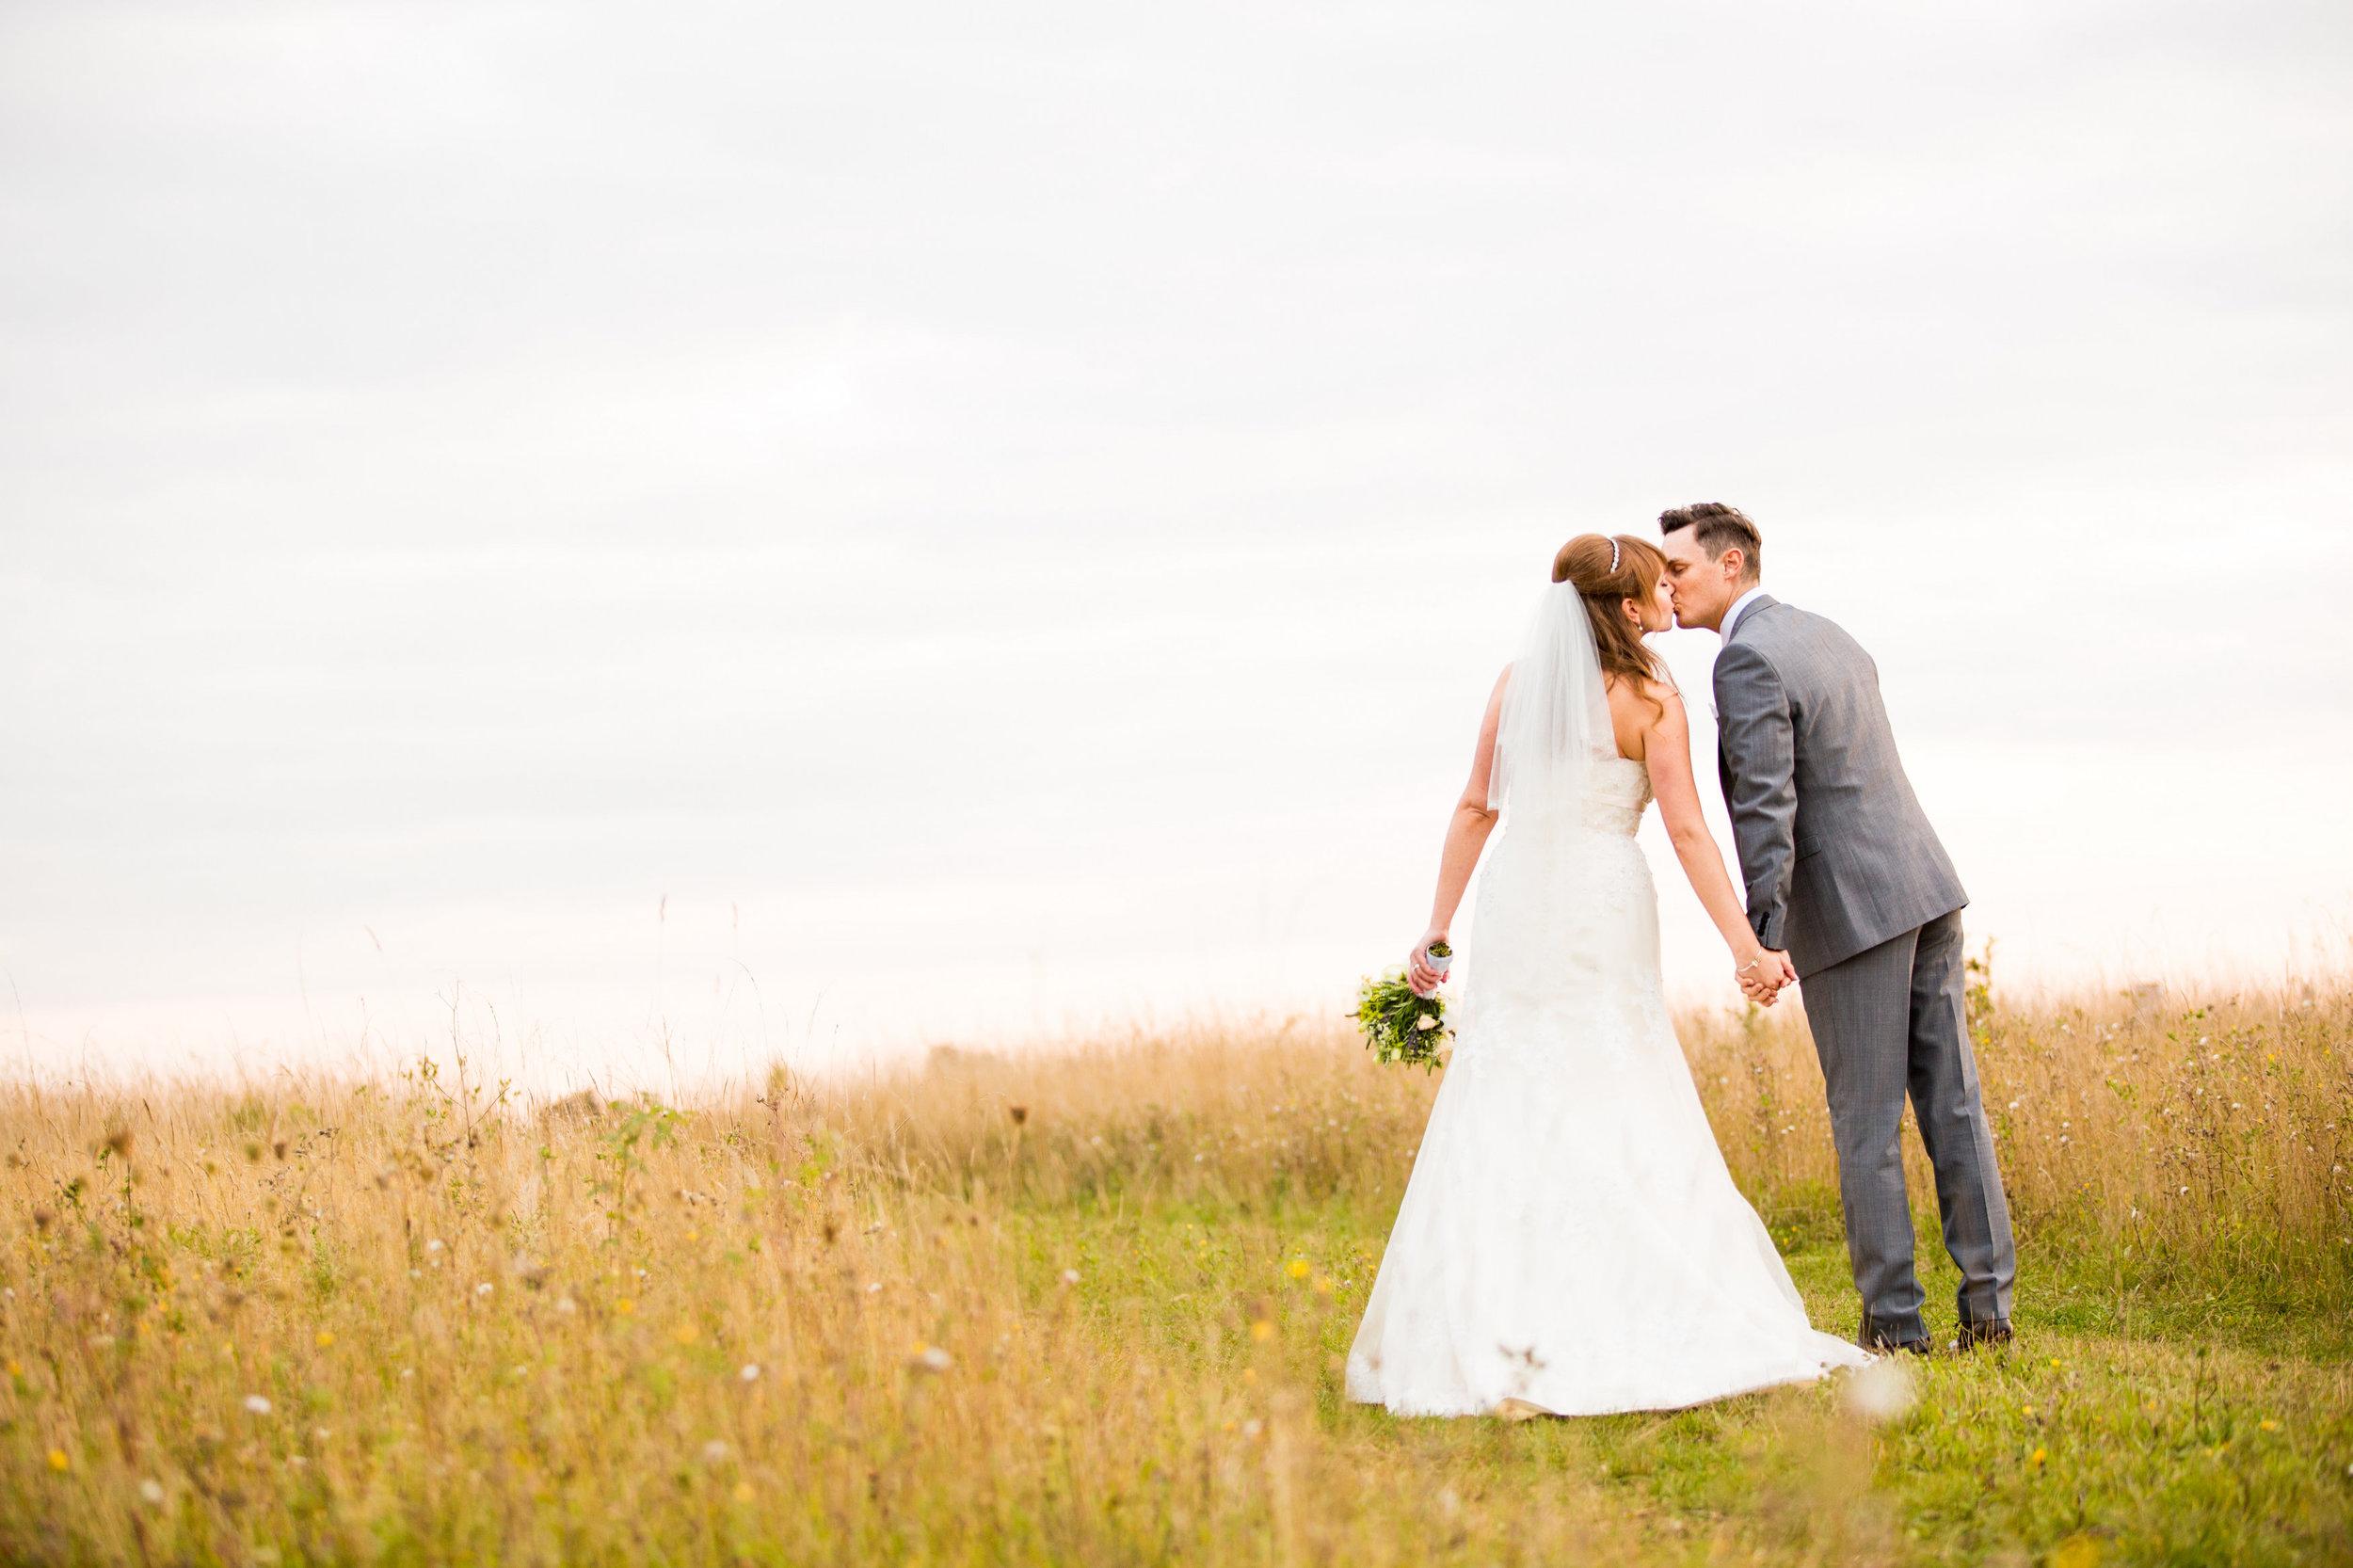 bride-and-groom-essex-wedding-venue.jpg